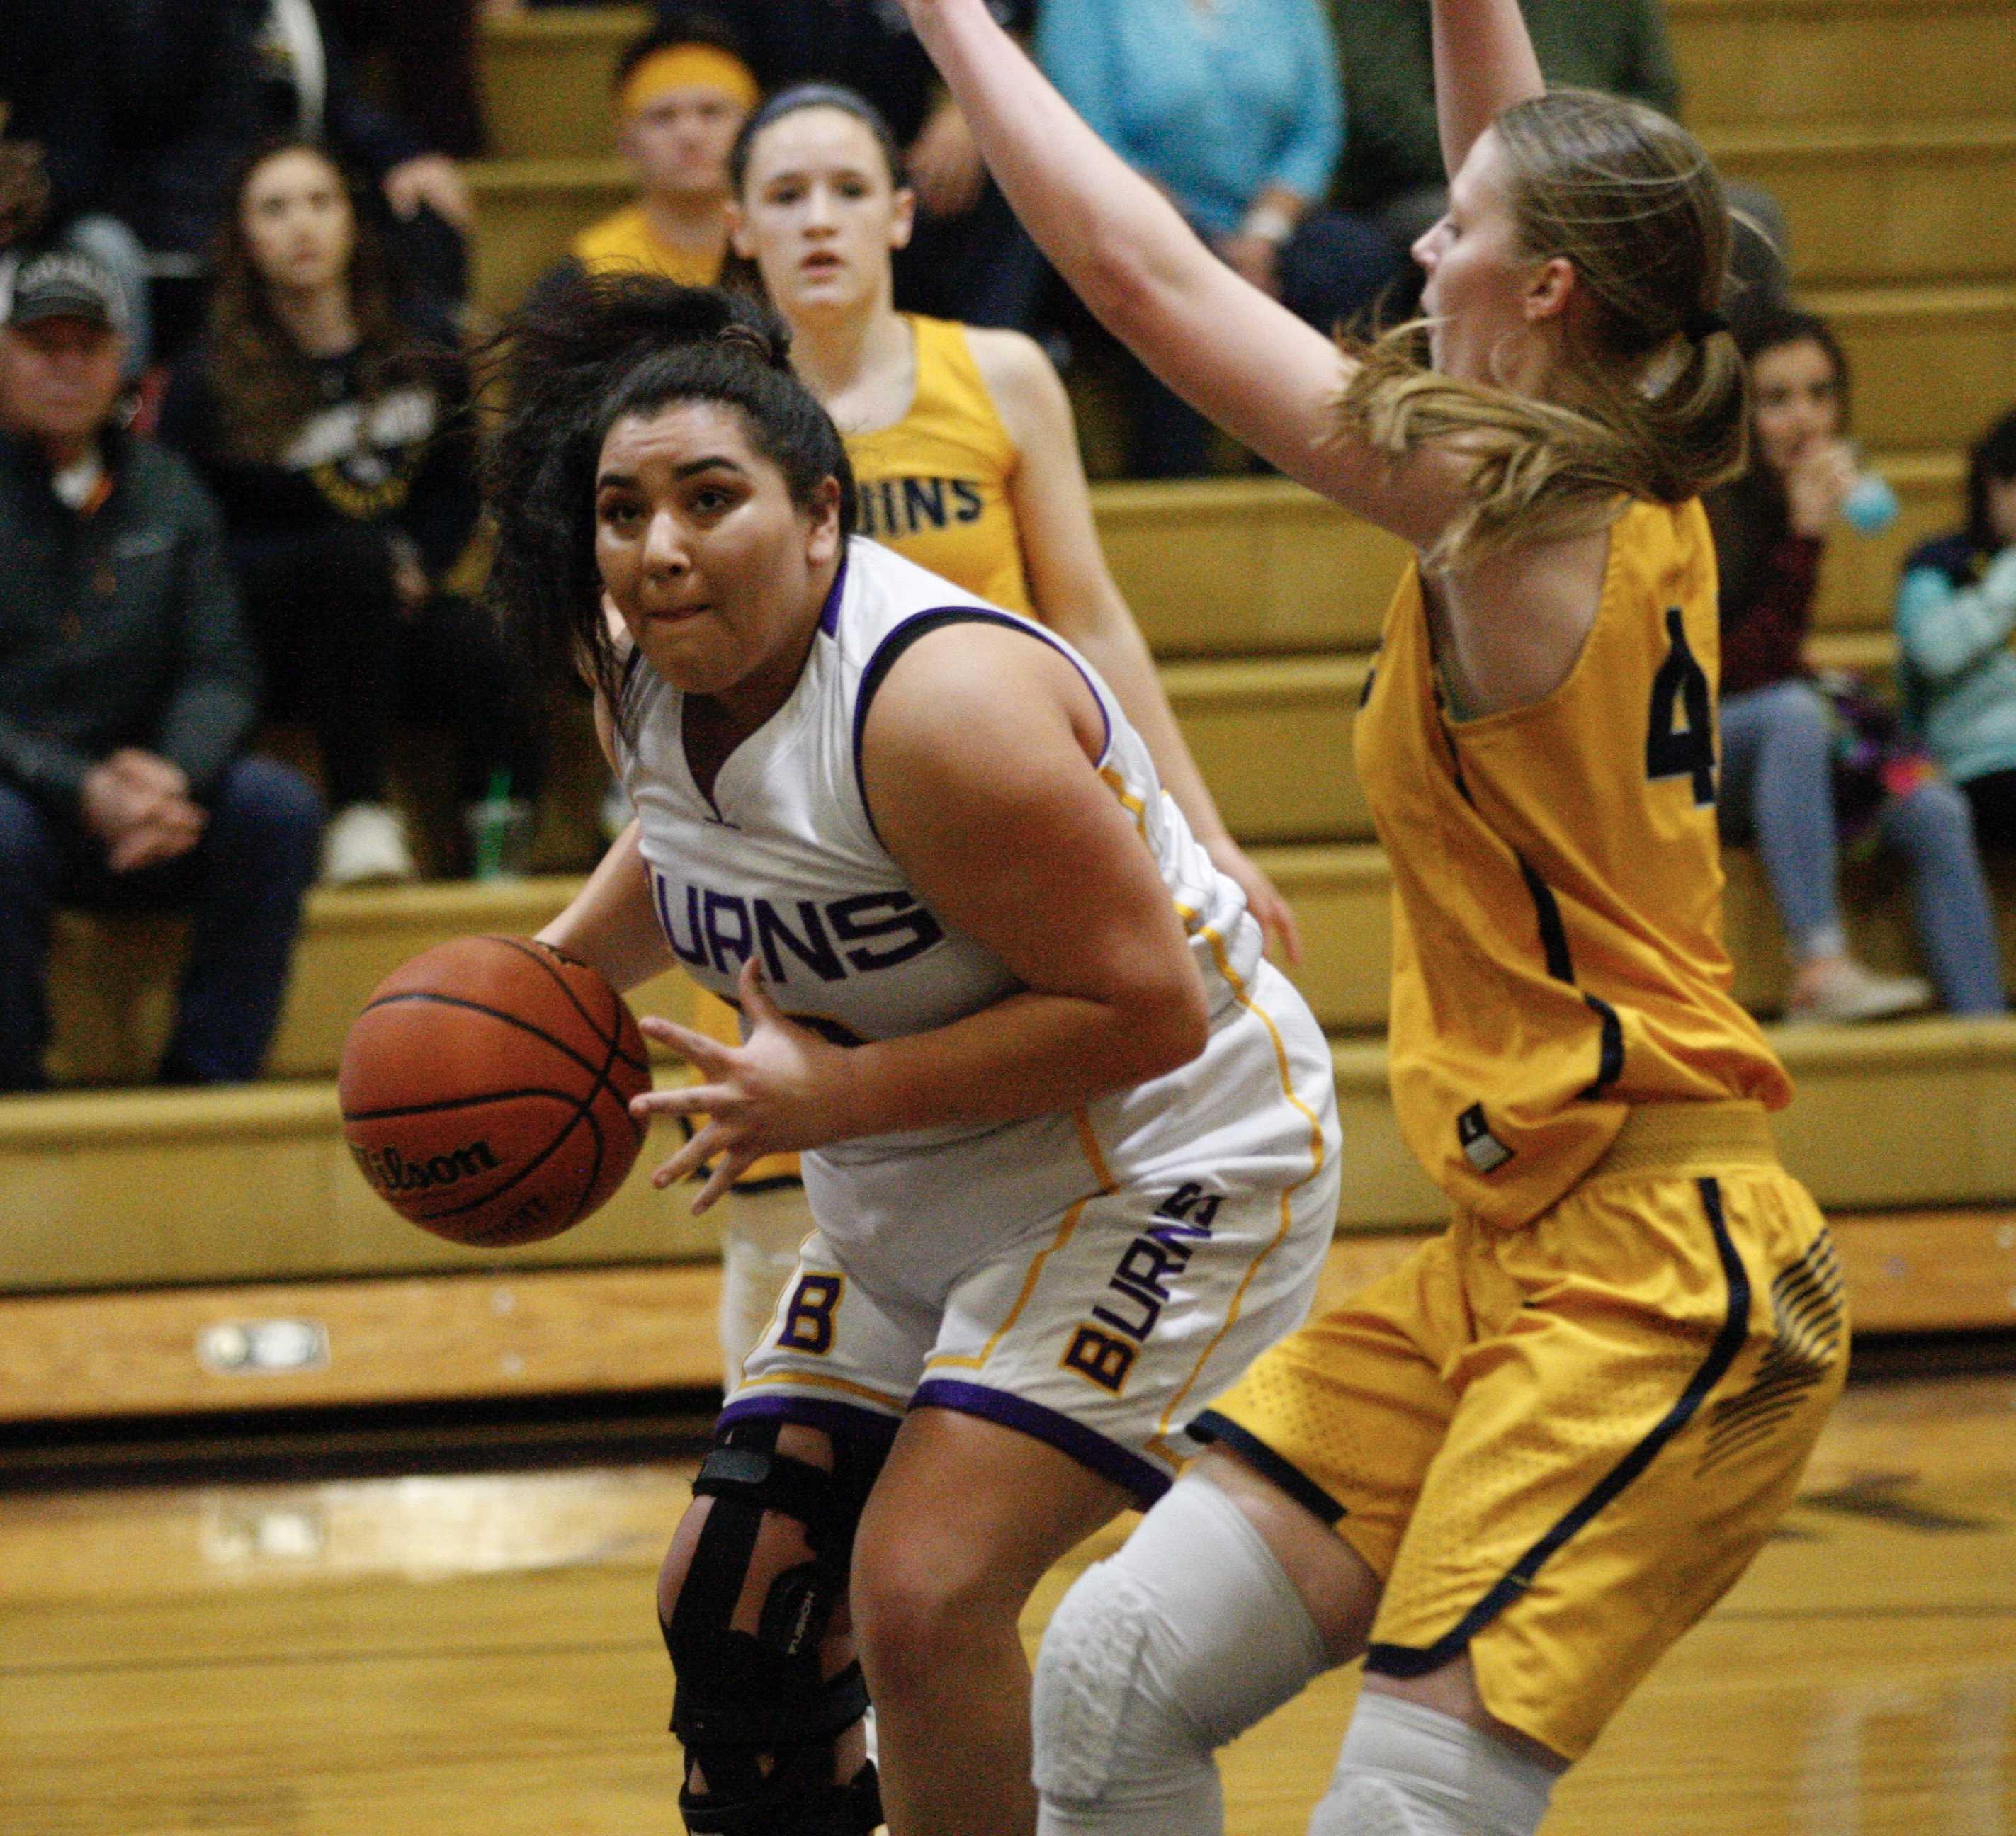 Burns forward Maliah Skunkcap muscles past the defense of Brookings-Harbor's Chloe McCrae. (Photo by Norm Maves. Jr.)